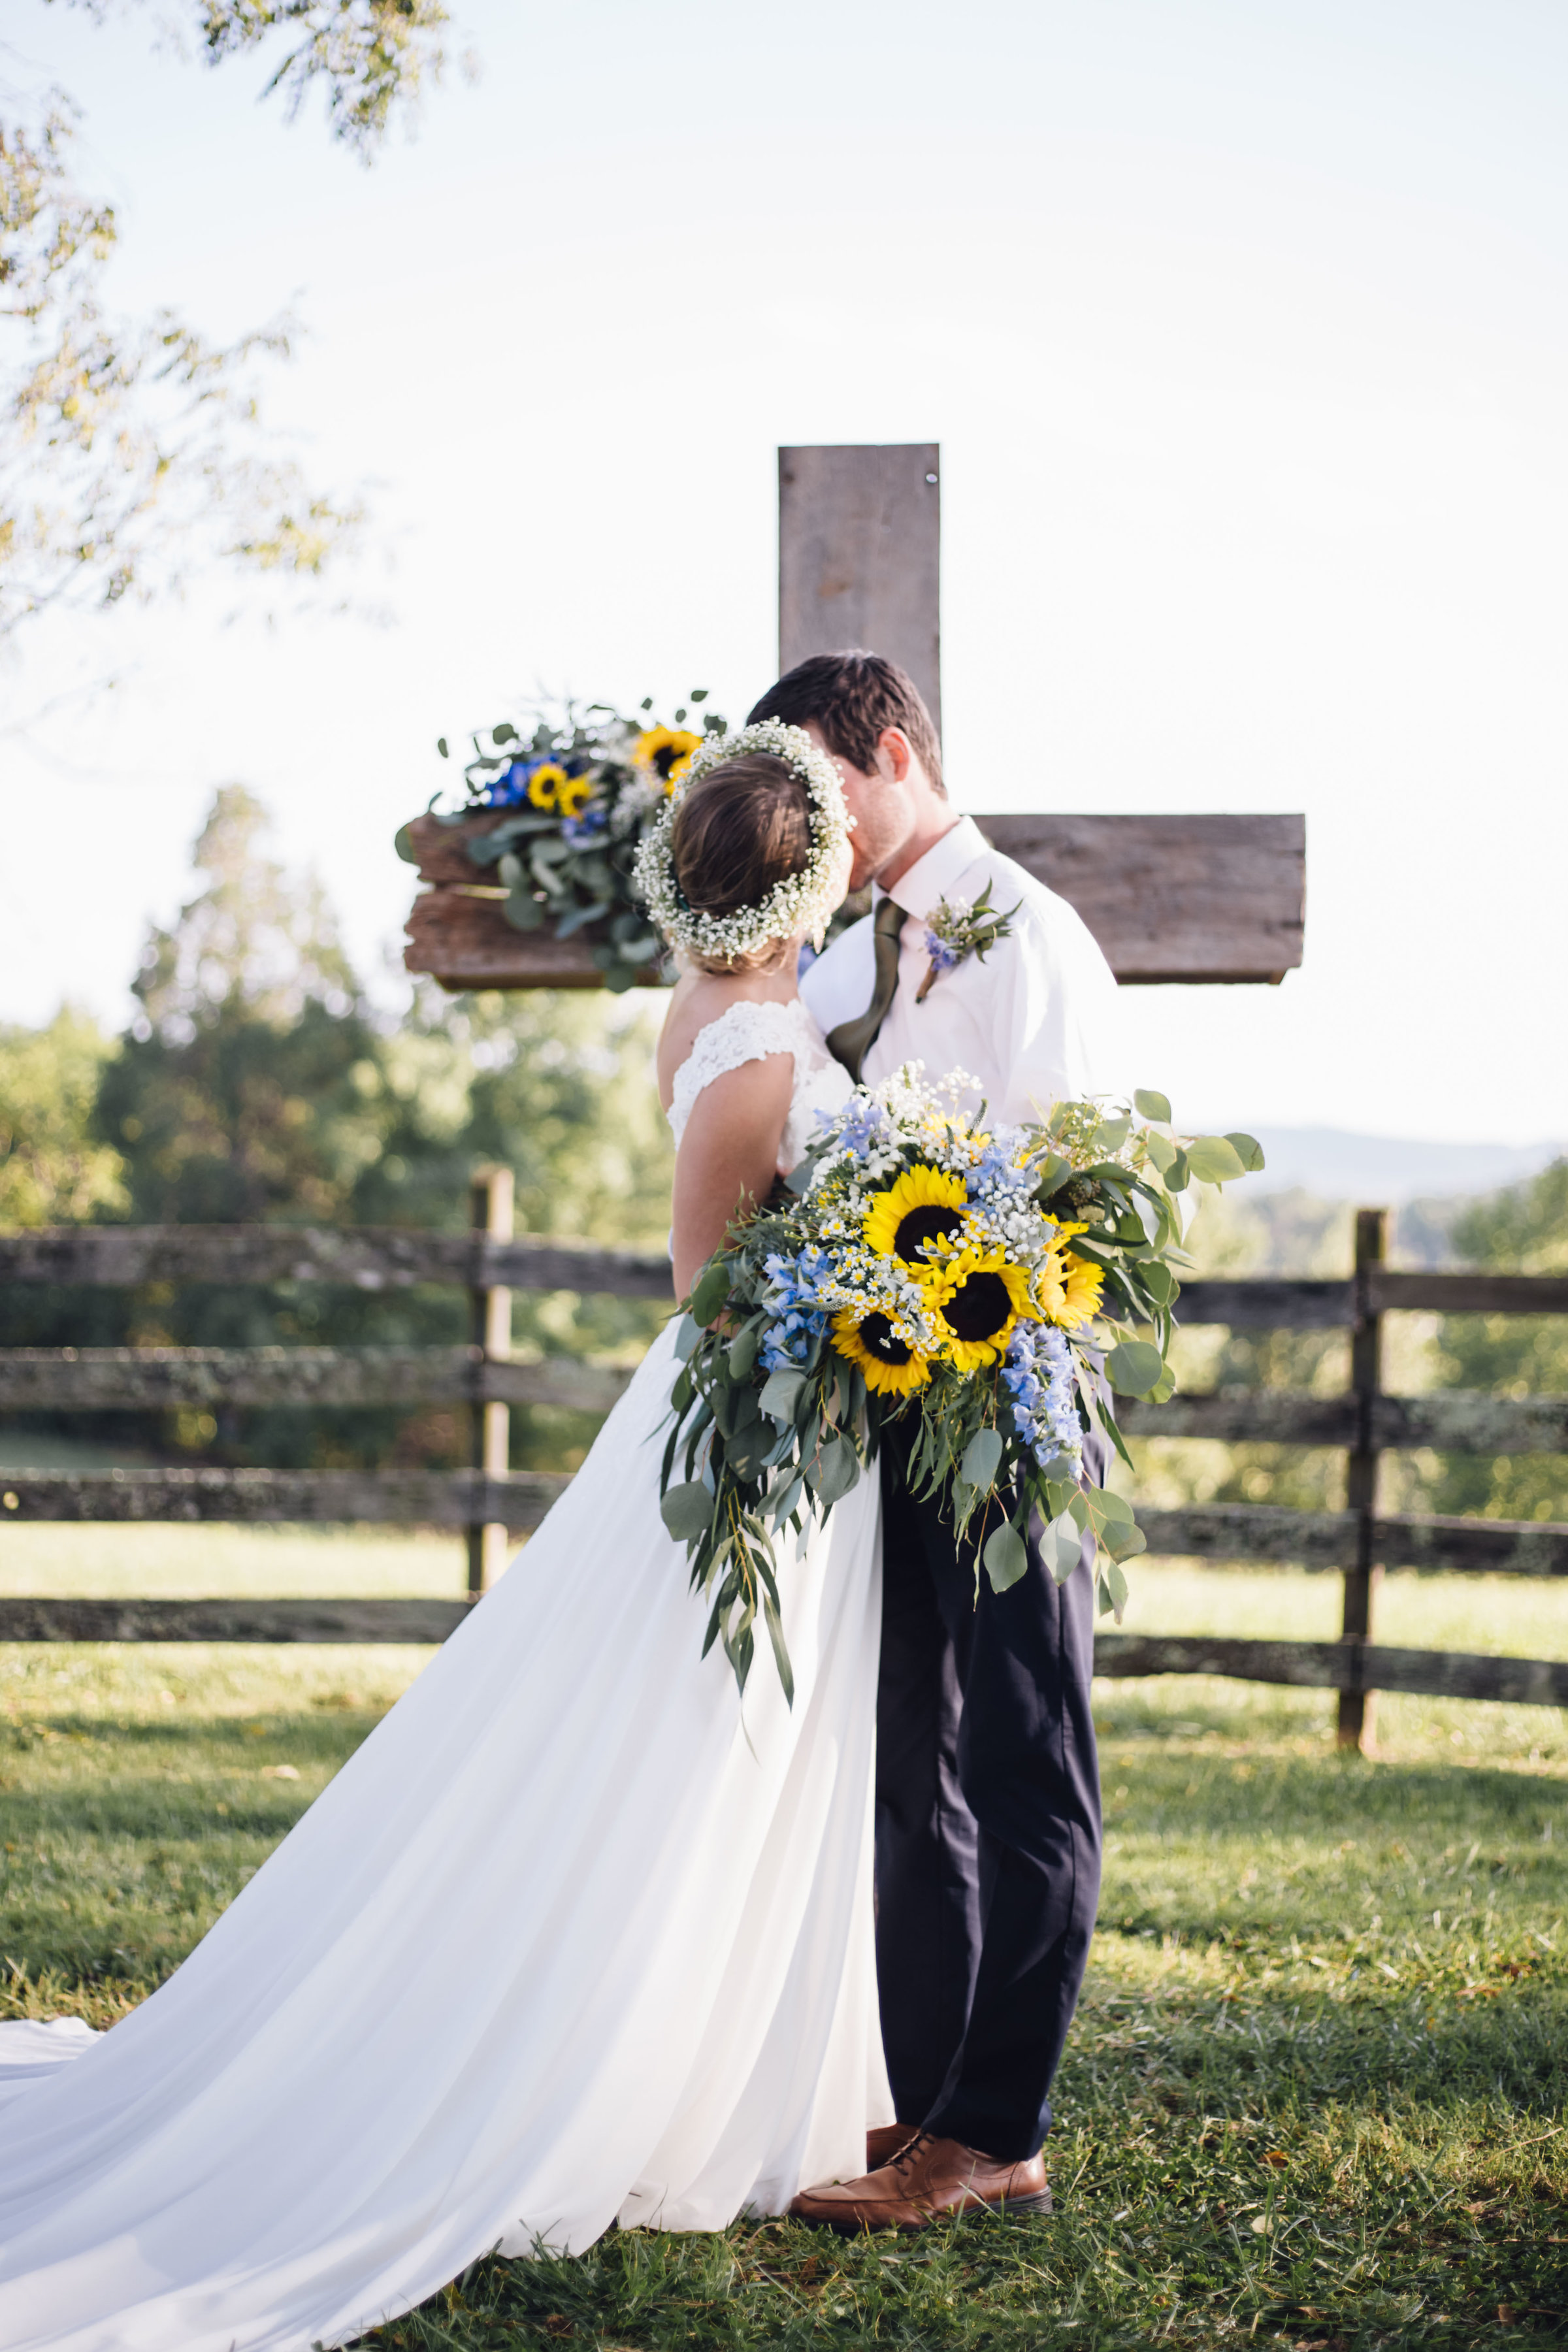 Heather & Jonathan - Photography by Laurel Creative